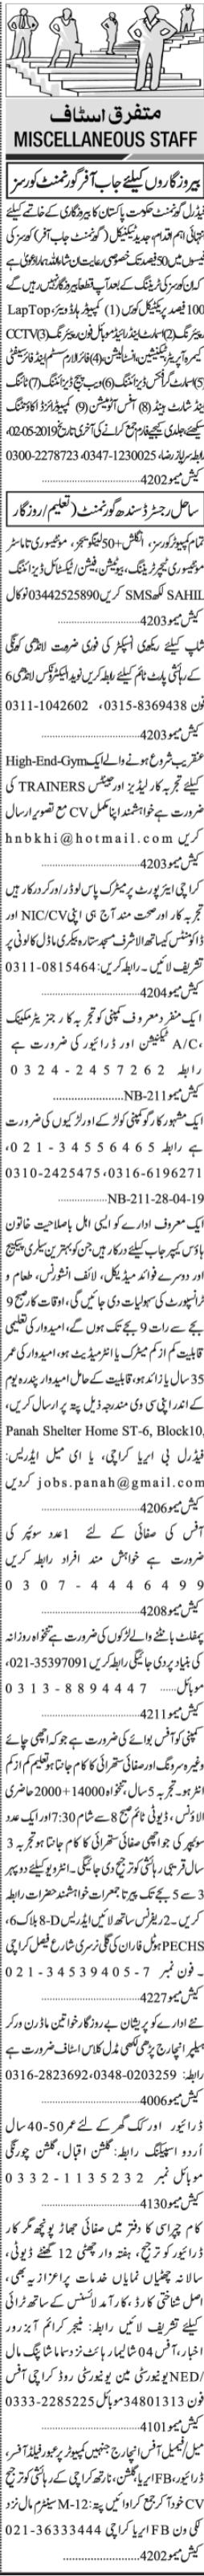 Daily Jang Miscellaneous Staff Jobs 2019 in Karachi